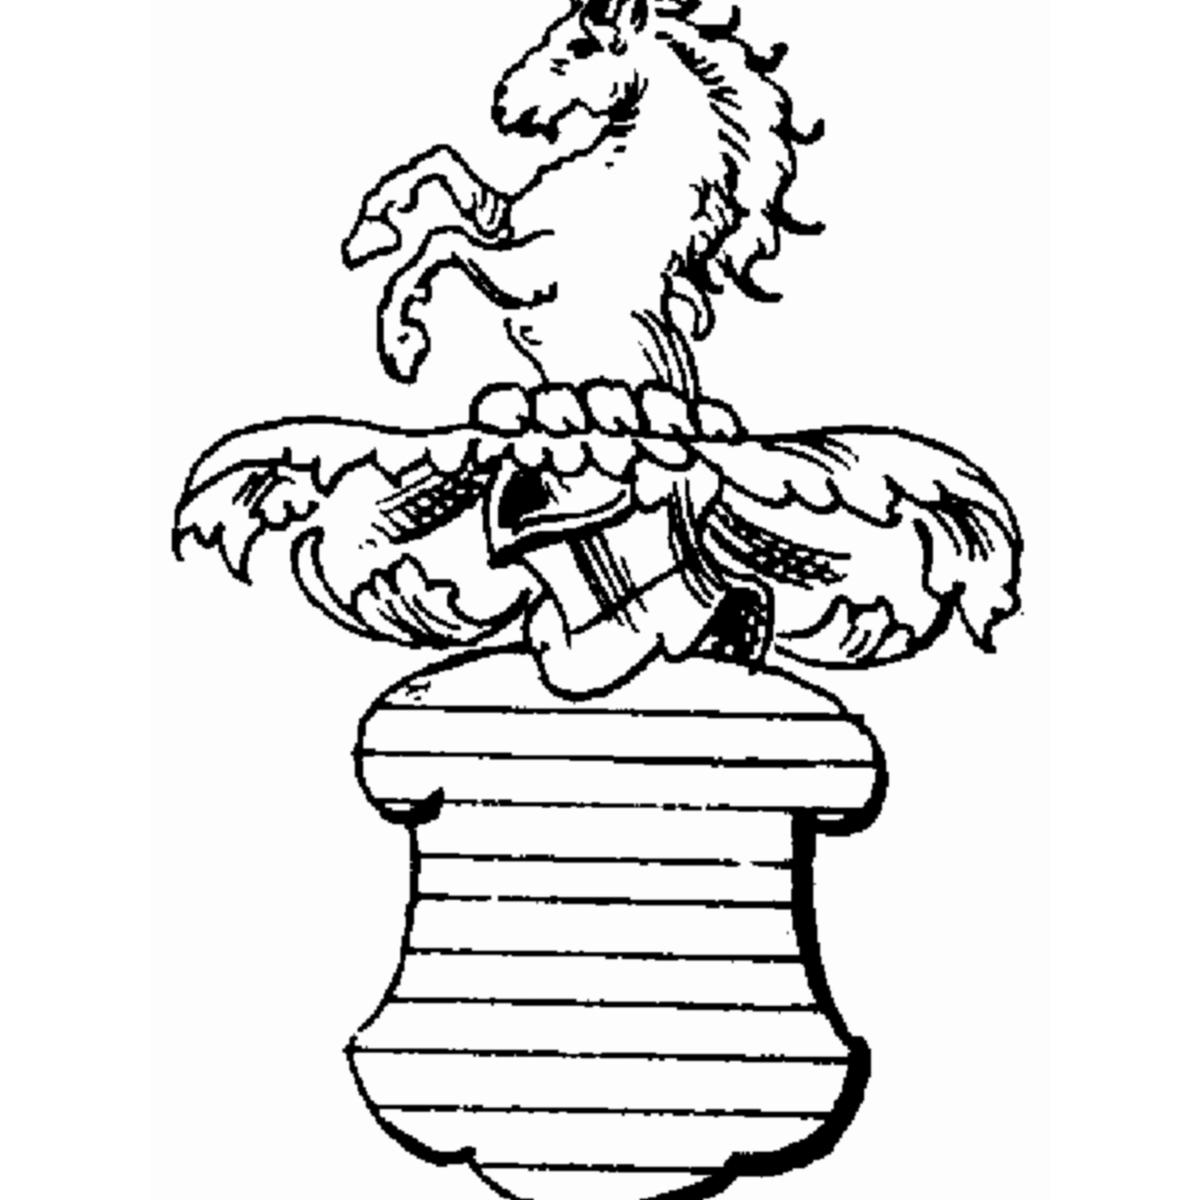 seekatz family heraldry genealogy coat of arms and last. Black Bedroom Furniture Sets. Home Design Ideas